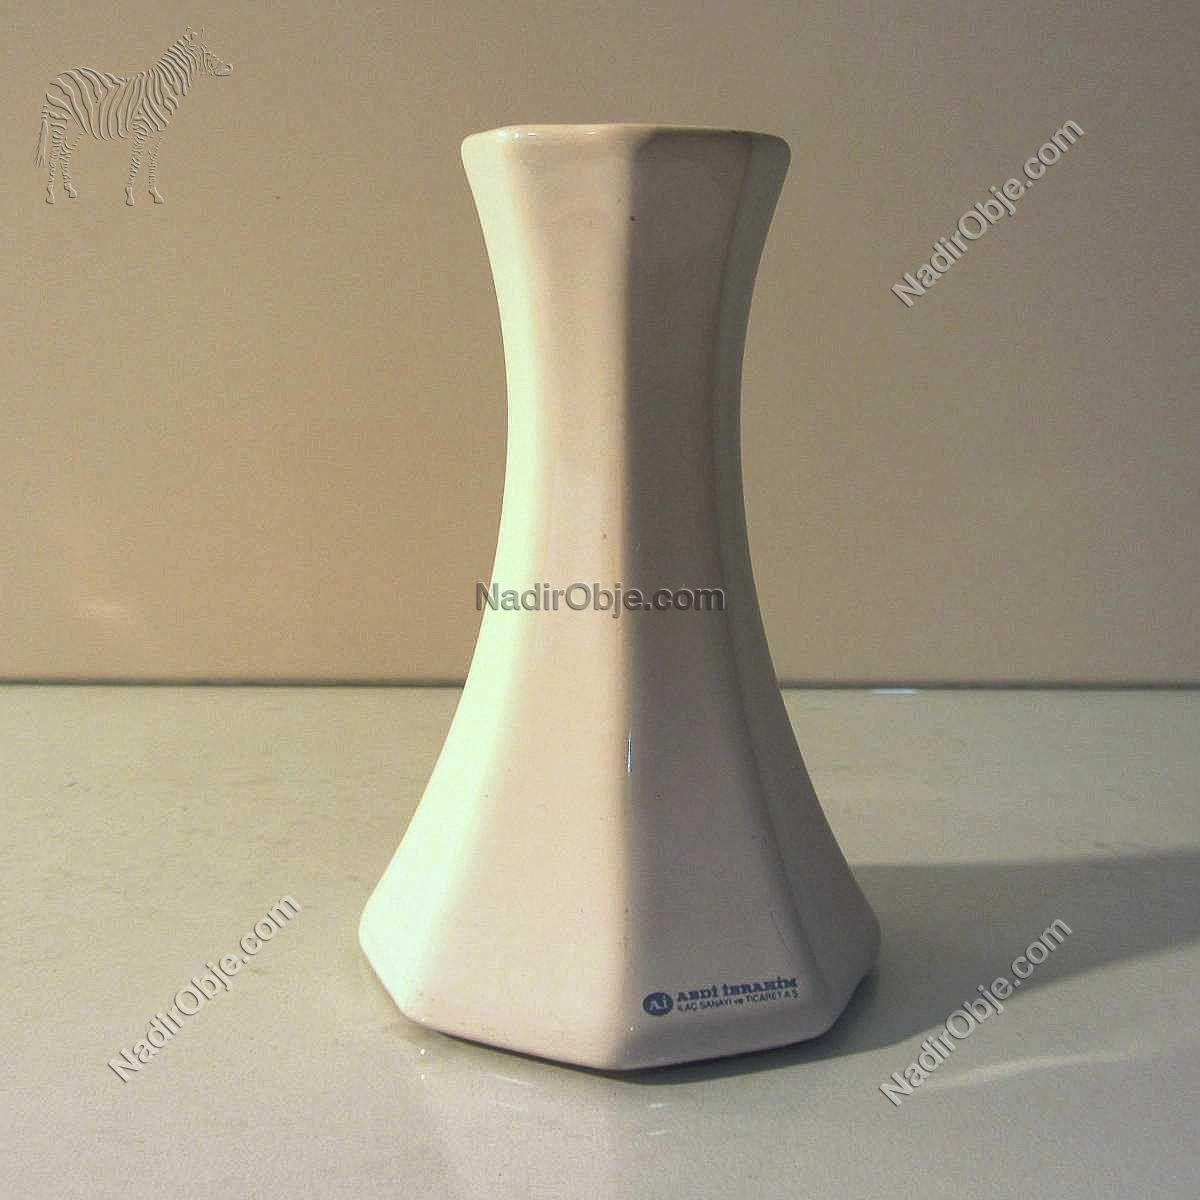 İlaç Promosyonu Porselen Vazo Seramik-Porselen Objeler İlaç